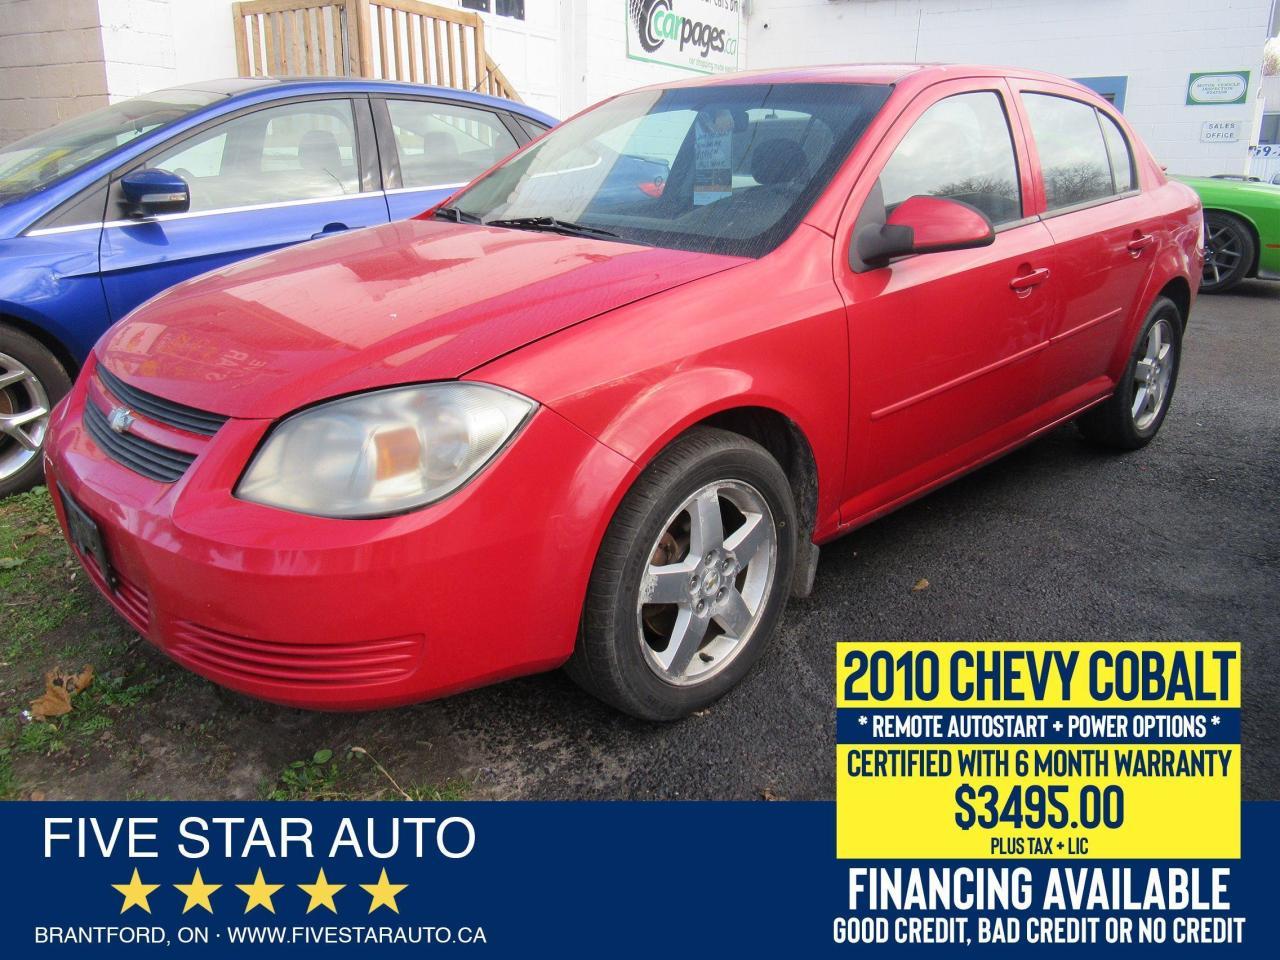 2010 Chevrolet Cobalt LT - Certified w/ 6 Month Warranty